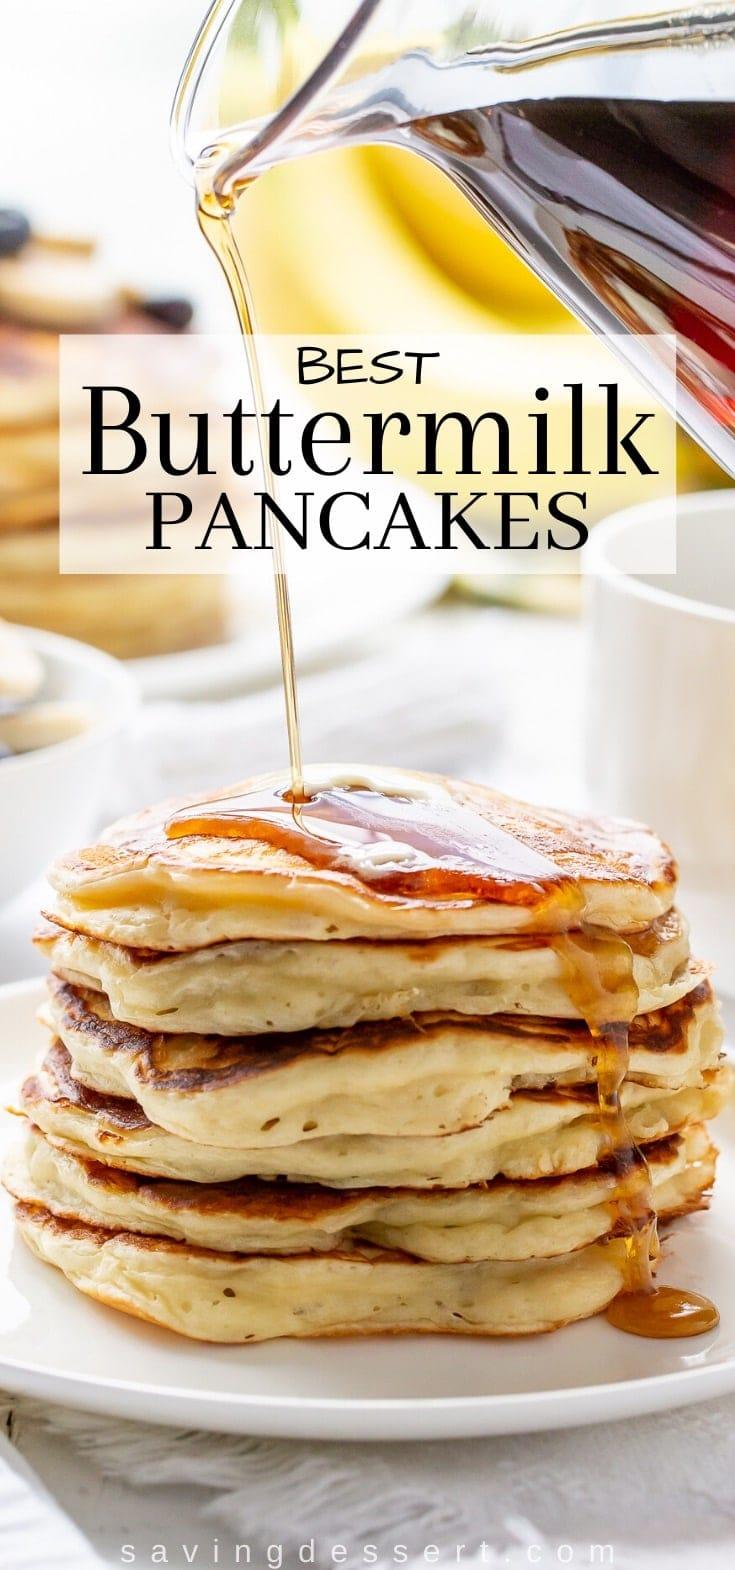 Best Buttermilk Pancakes Recipe In 2020 Buttermilk Pancakes Breakfast Brunch Recipes Recipes